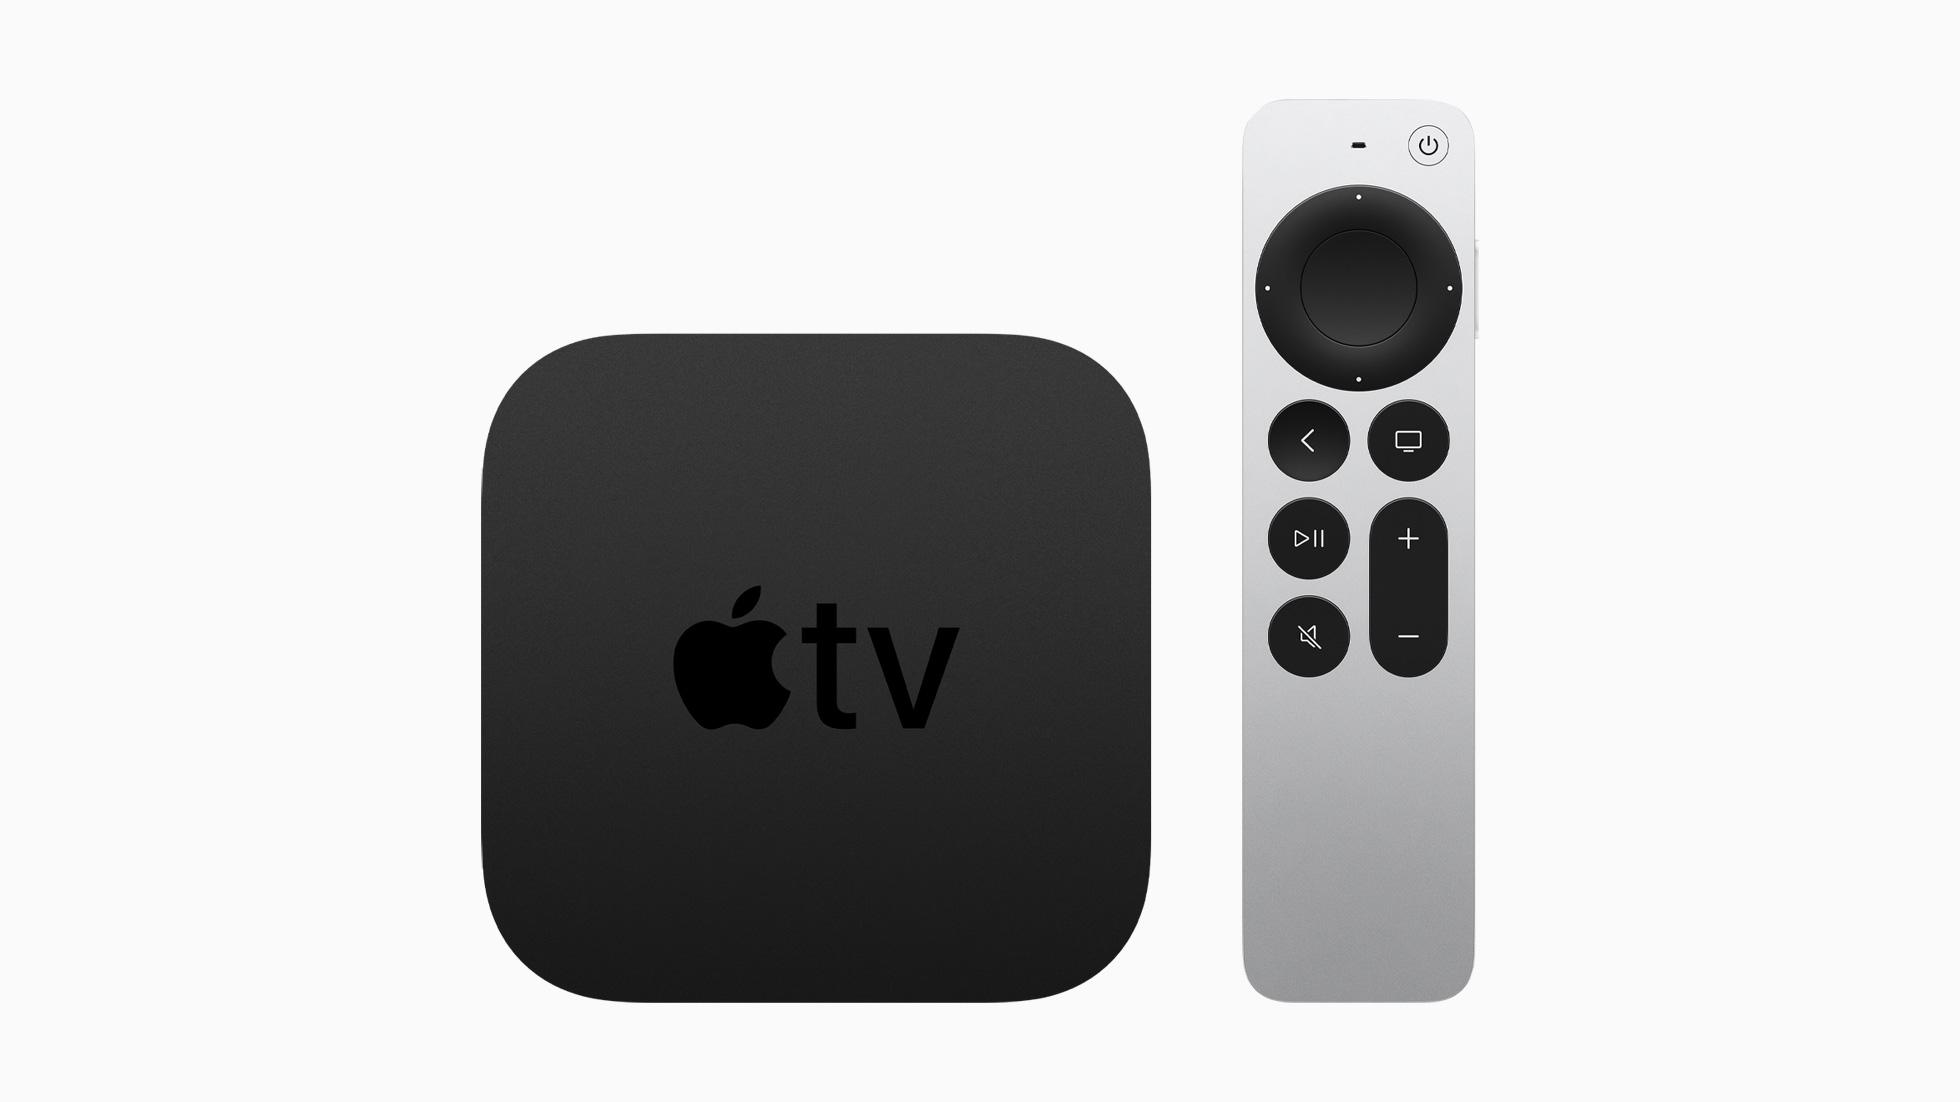 Apple unveils the next gen of AppleTV4K 042021 big